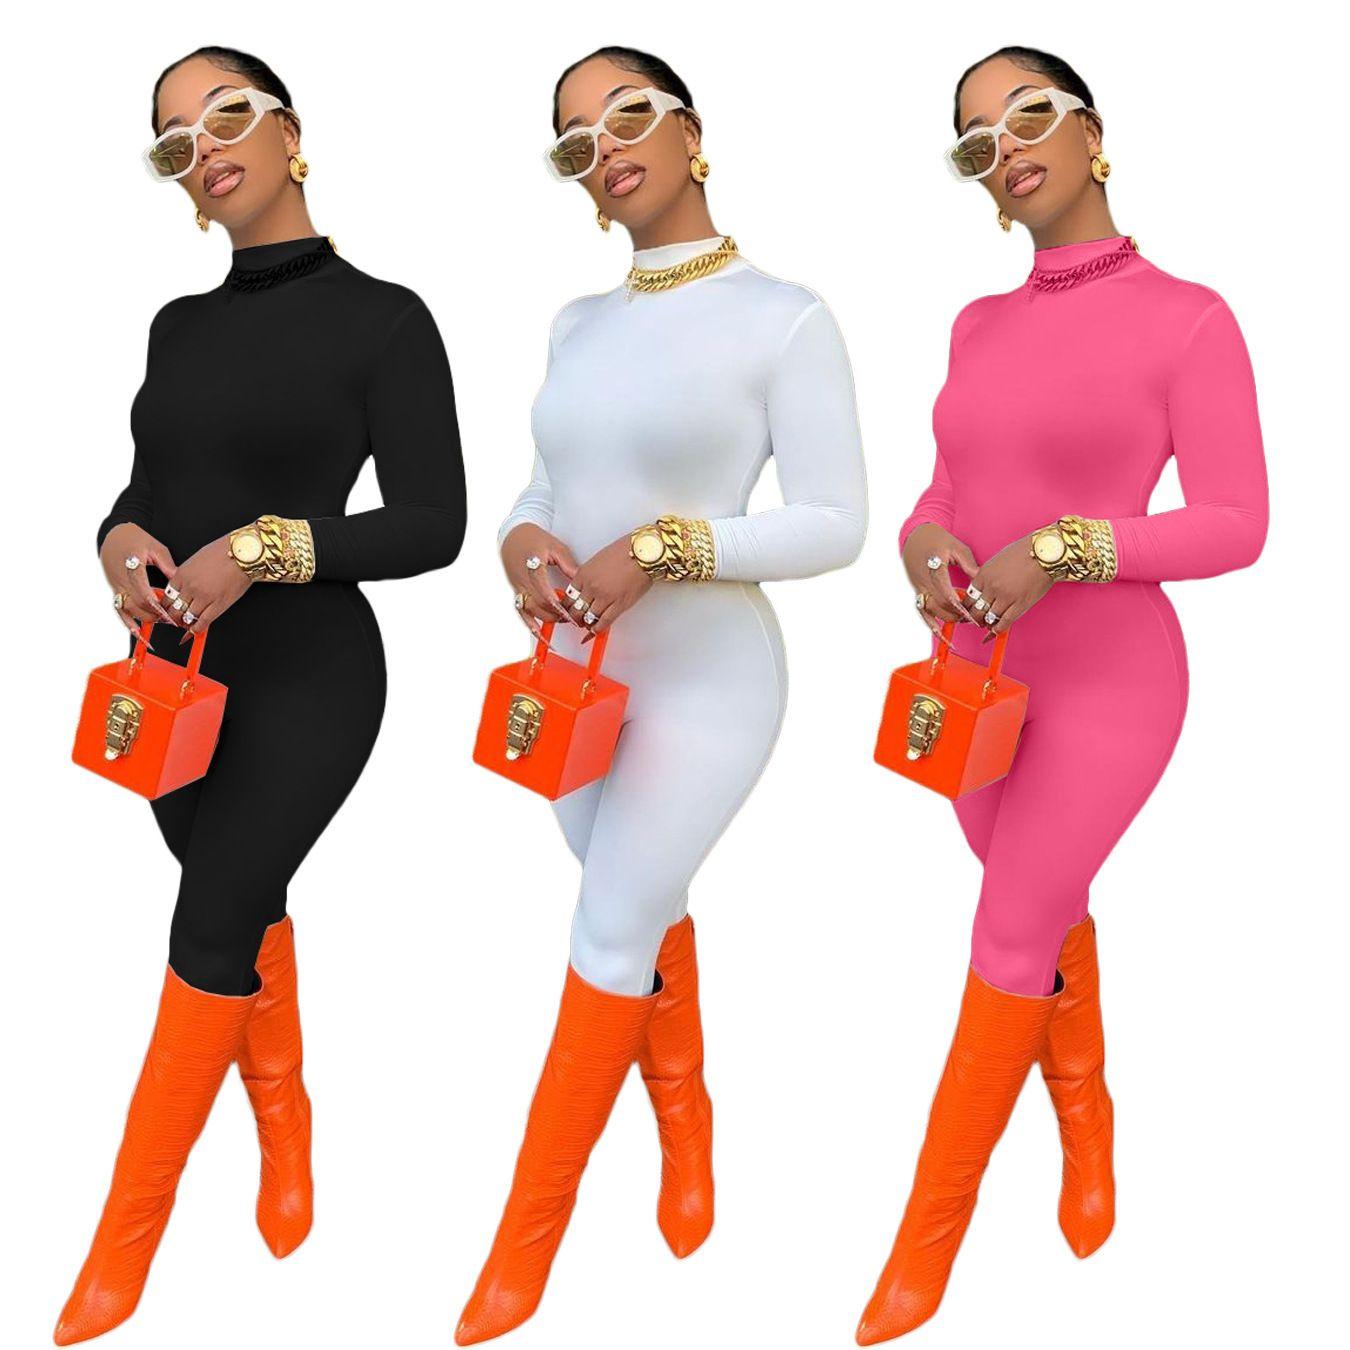 2021 Frühling Frauen Jumpsuit Reißverschluss Skinny Bodycon Langarm Strampler Womens Overall Outfit Overalls für Frauen 210506